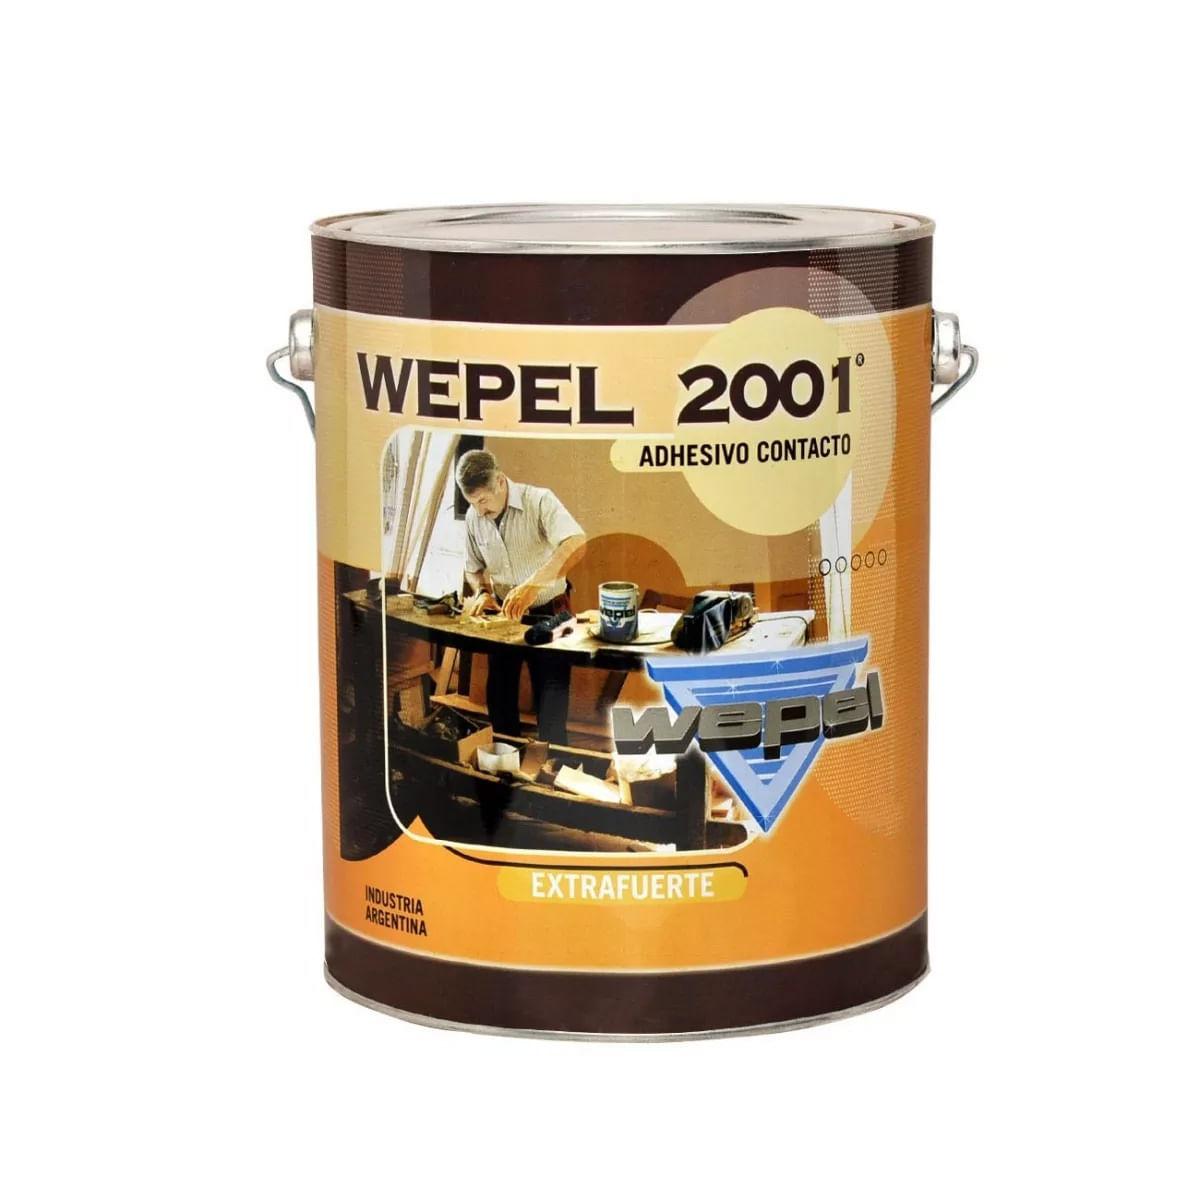 adhesivo-contacto-wepel